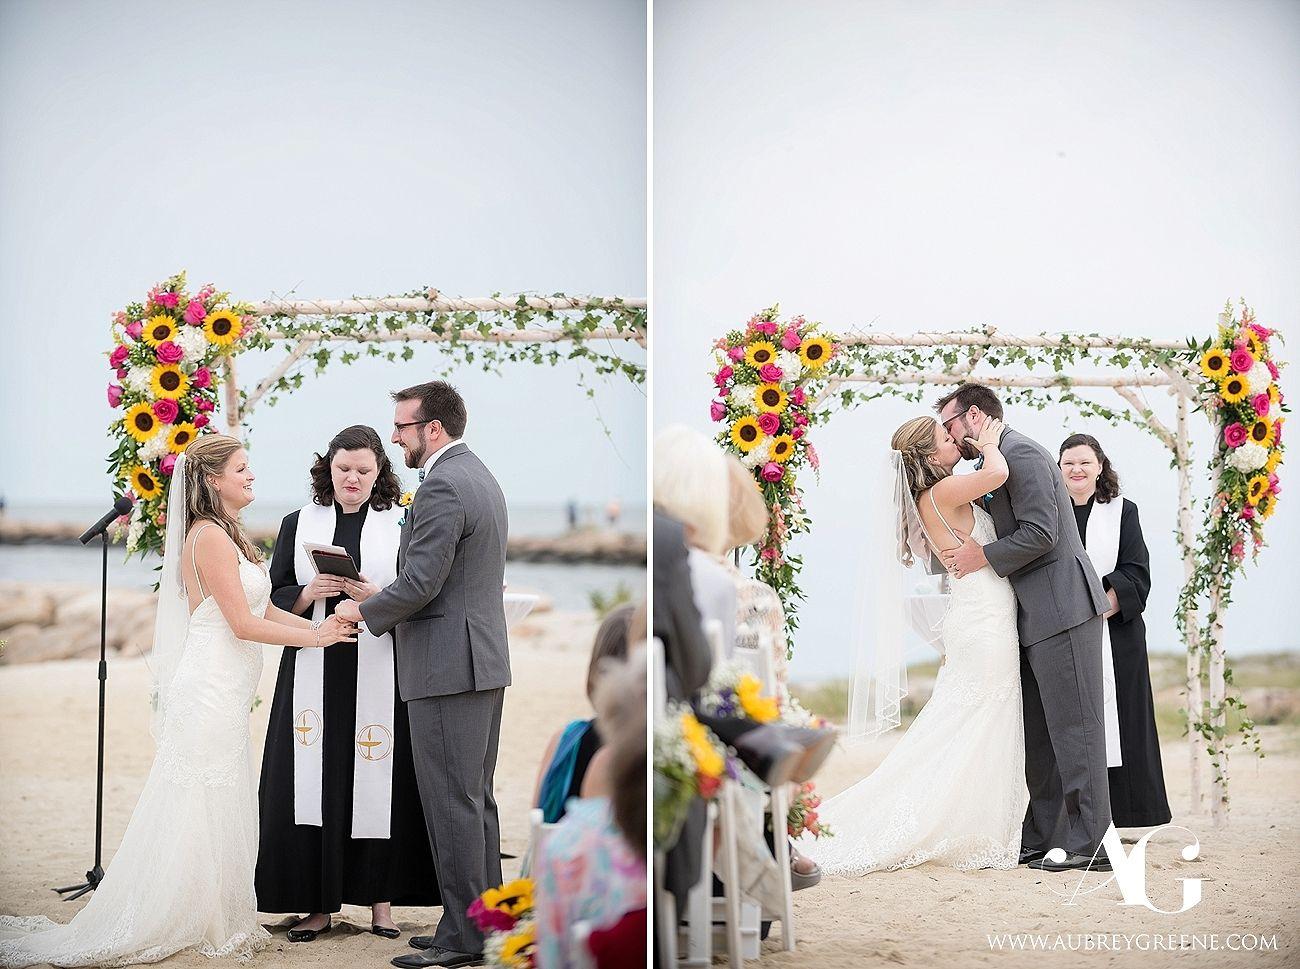 Enchanting Wedding Flowers Townsville Pattern - Wedding Idea 2018 ...